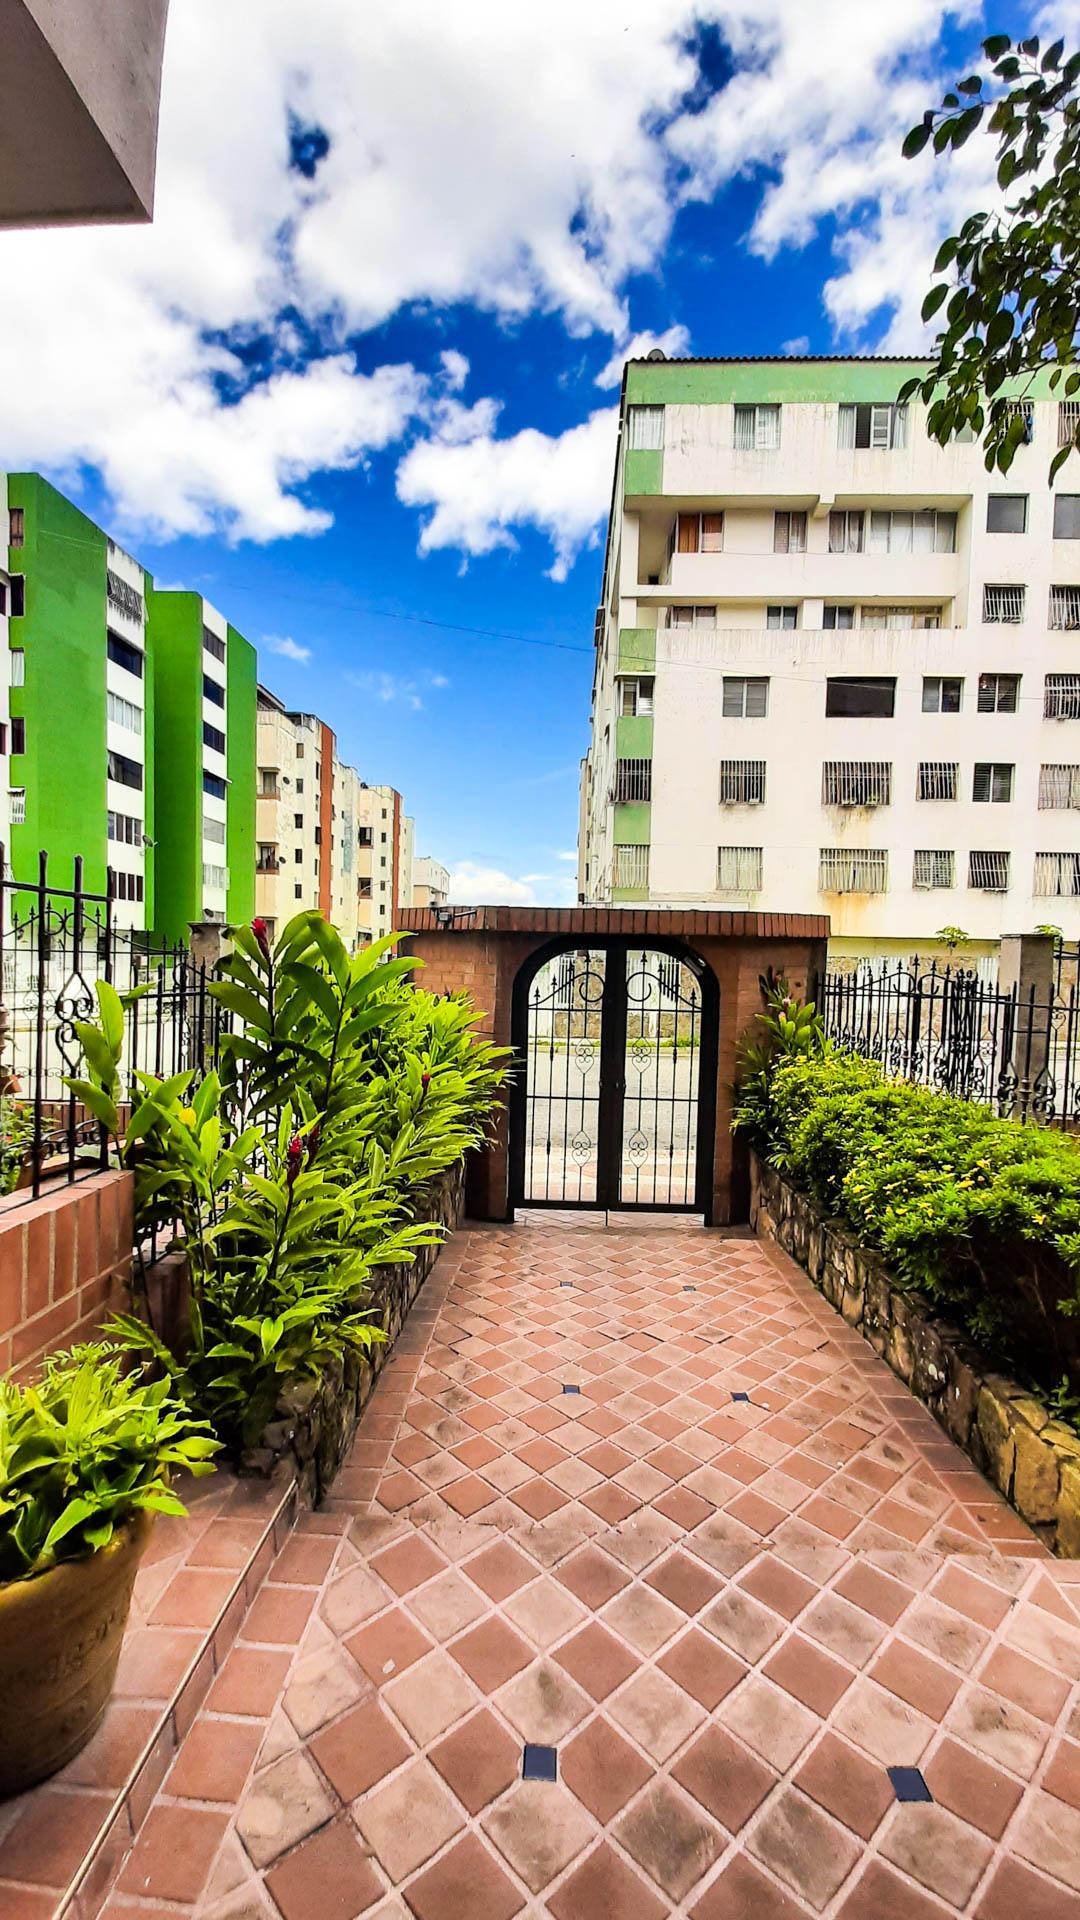 Apartamento, Paseo de la Feria